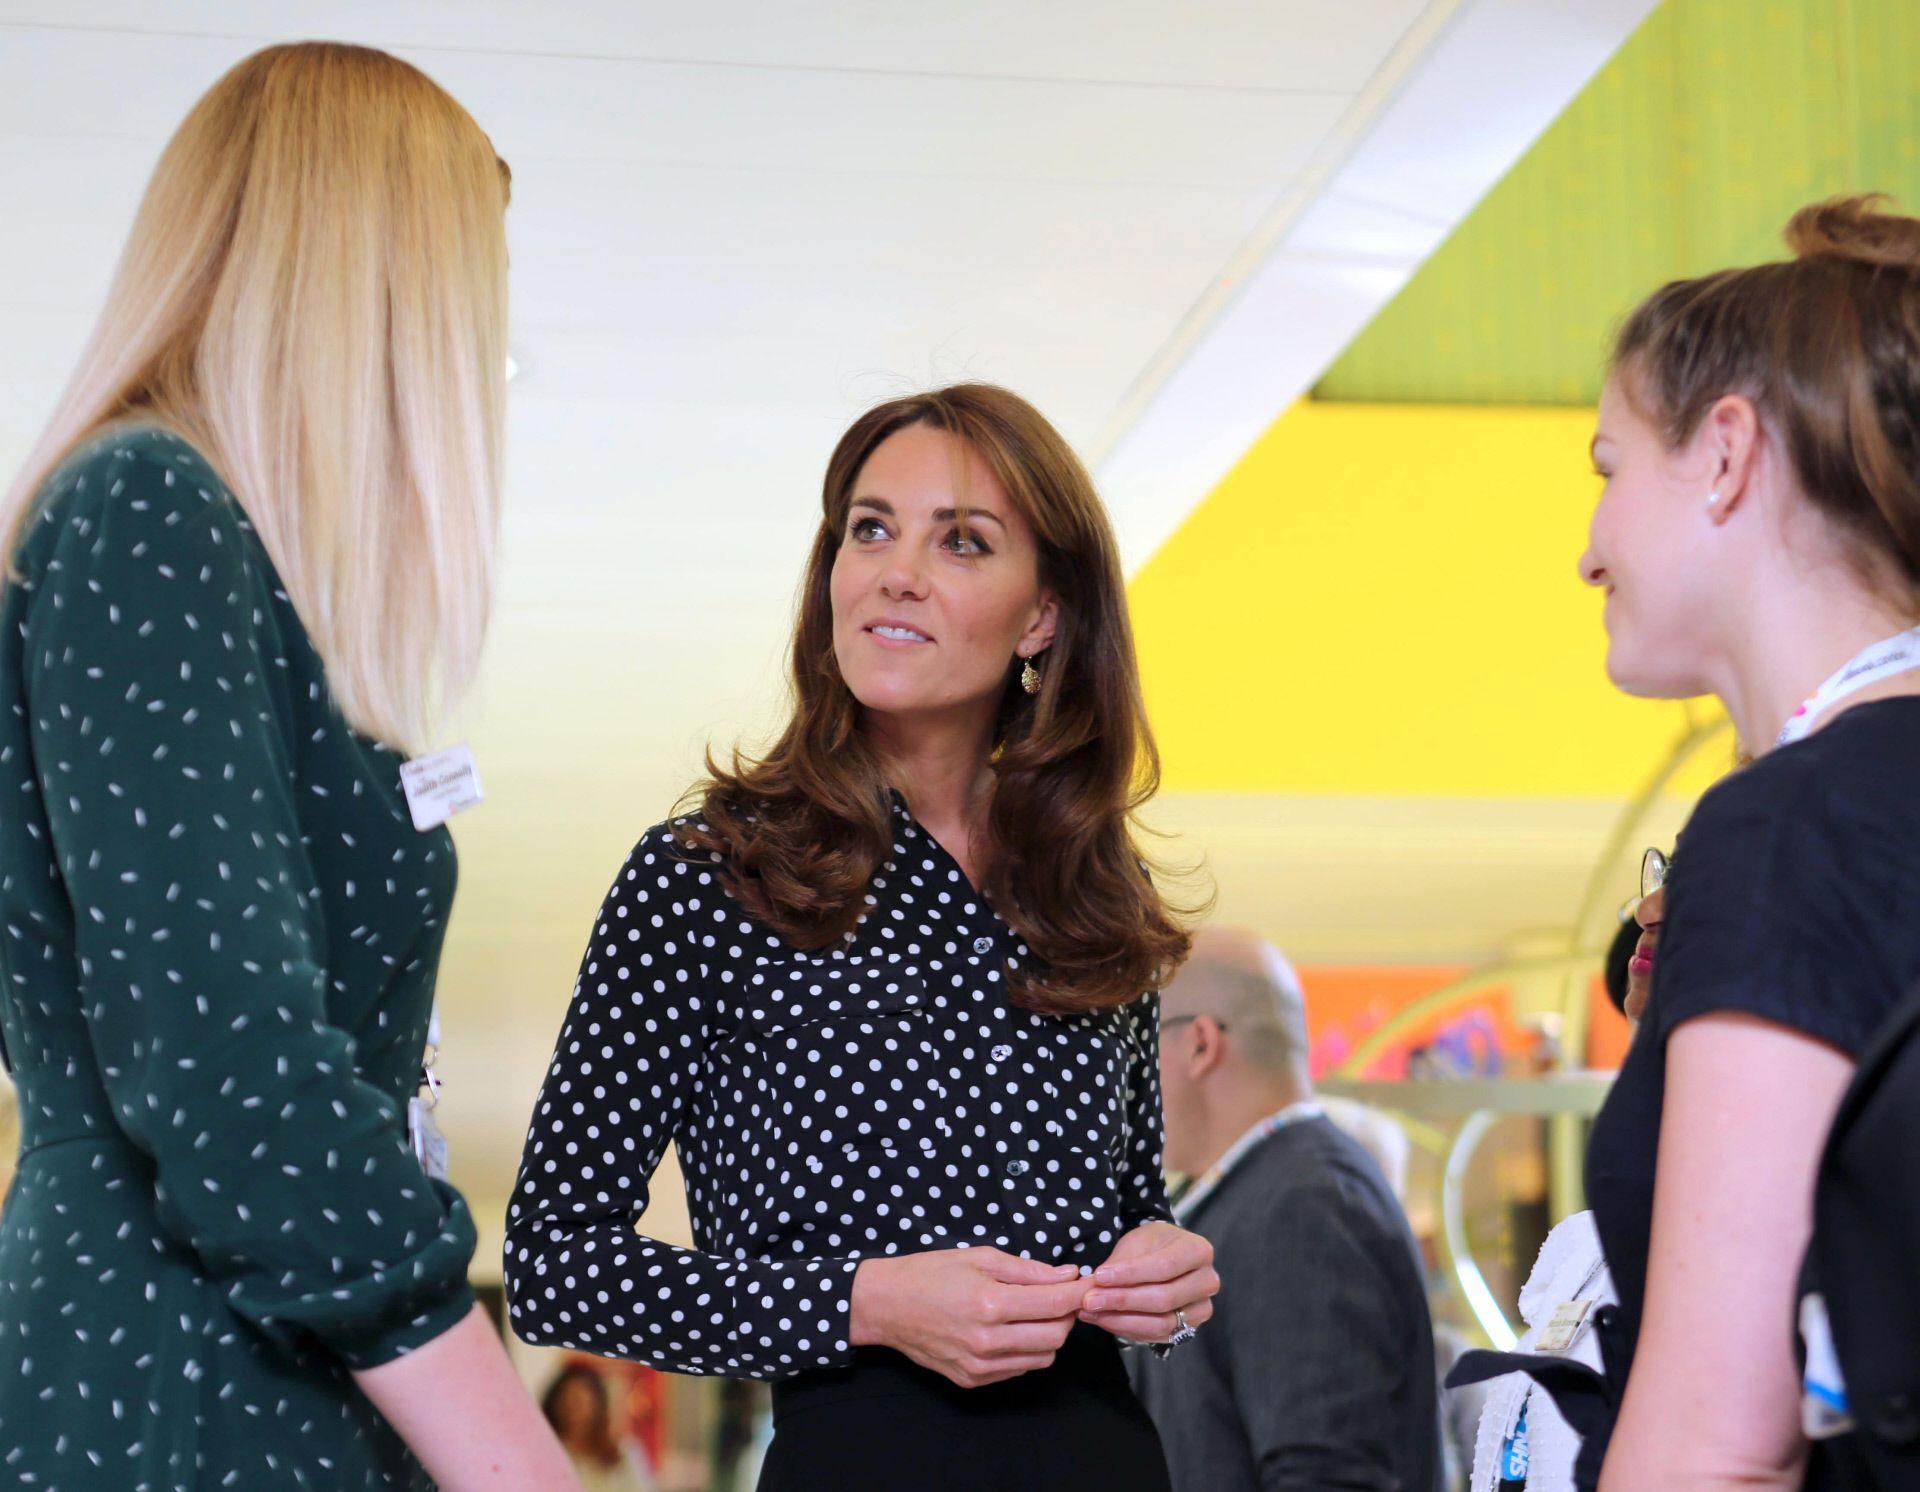 Kate Middleton se apunta a la moda de los pantalones palazzo